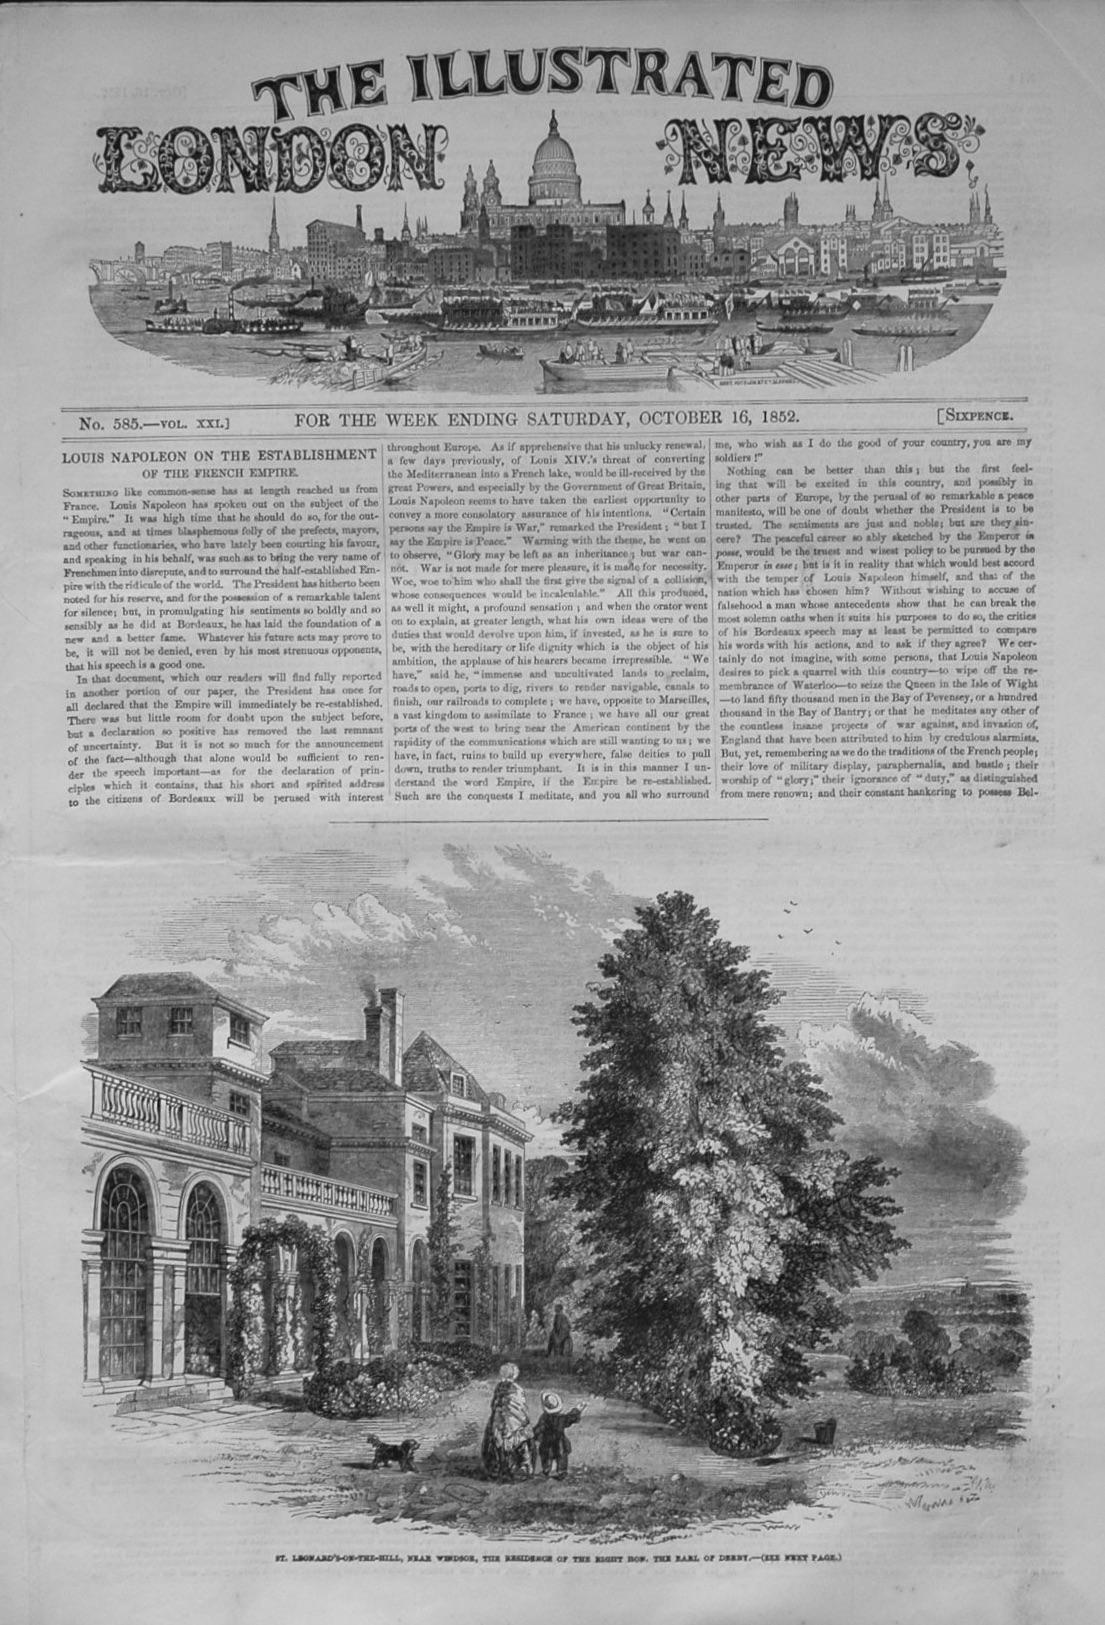 Illustrated London News October 16, 1852.